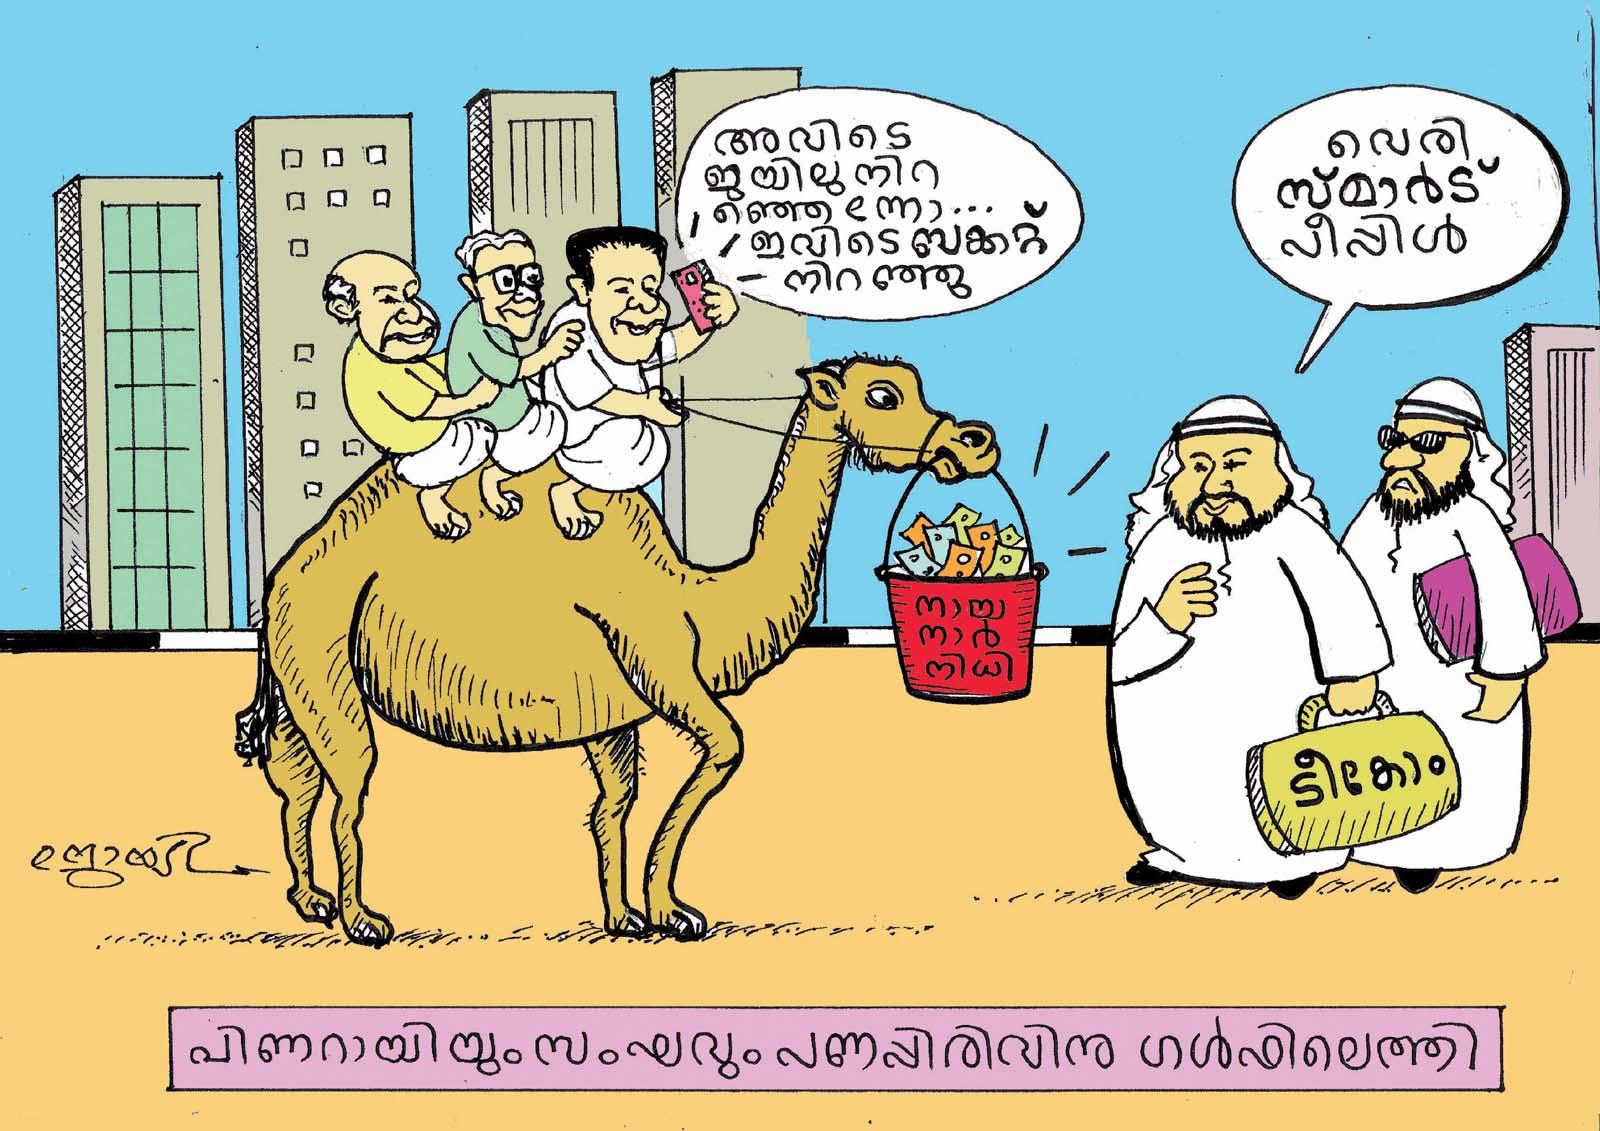 Cartoonist Joy Kulanada Posted by Joy Kulanada at